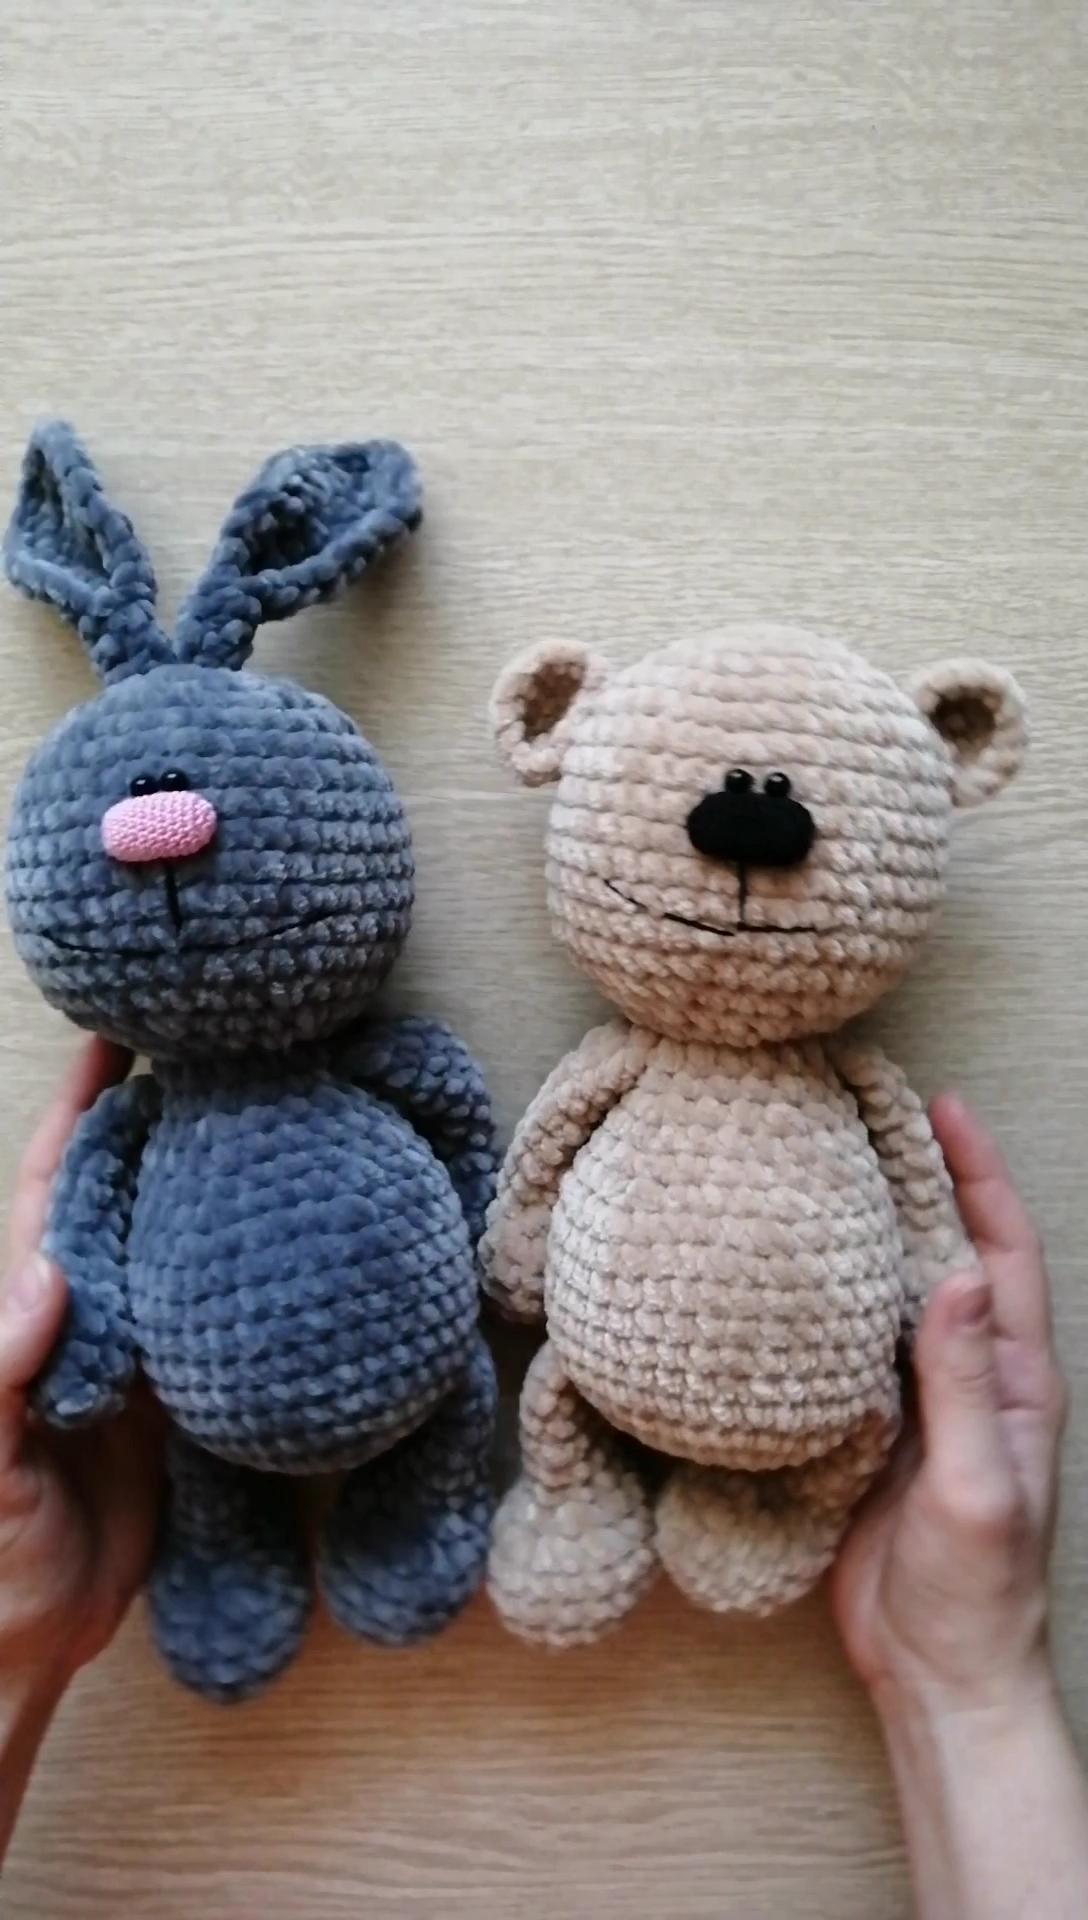 Amigurumi Bunny Free Crochet Pattern   Crochet bunny pattern ...   1920x1088